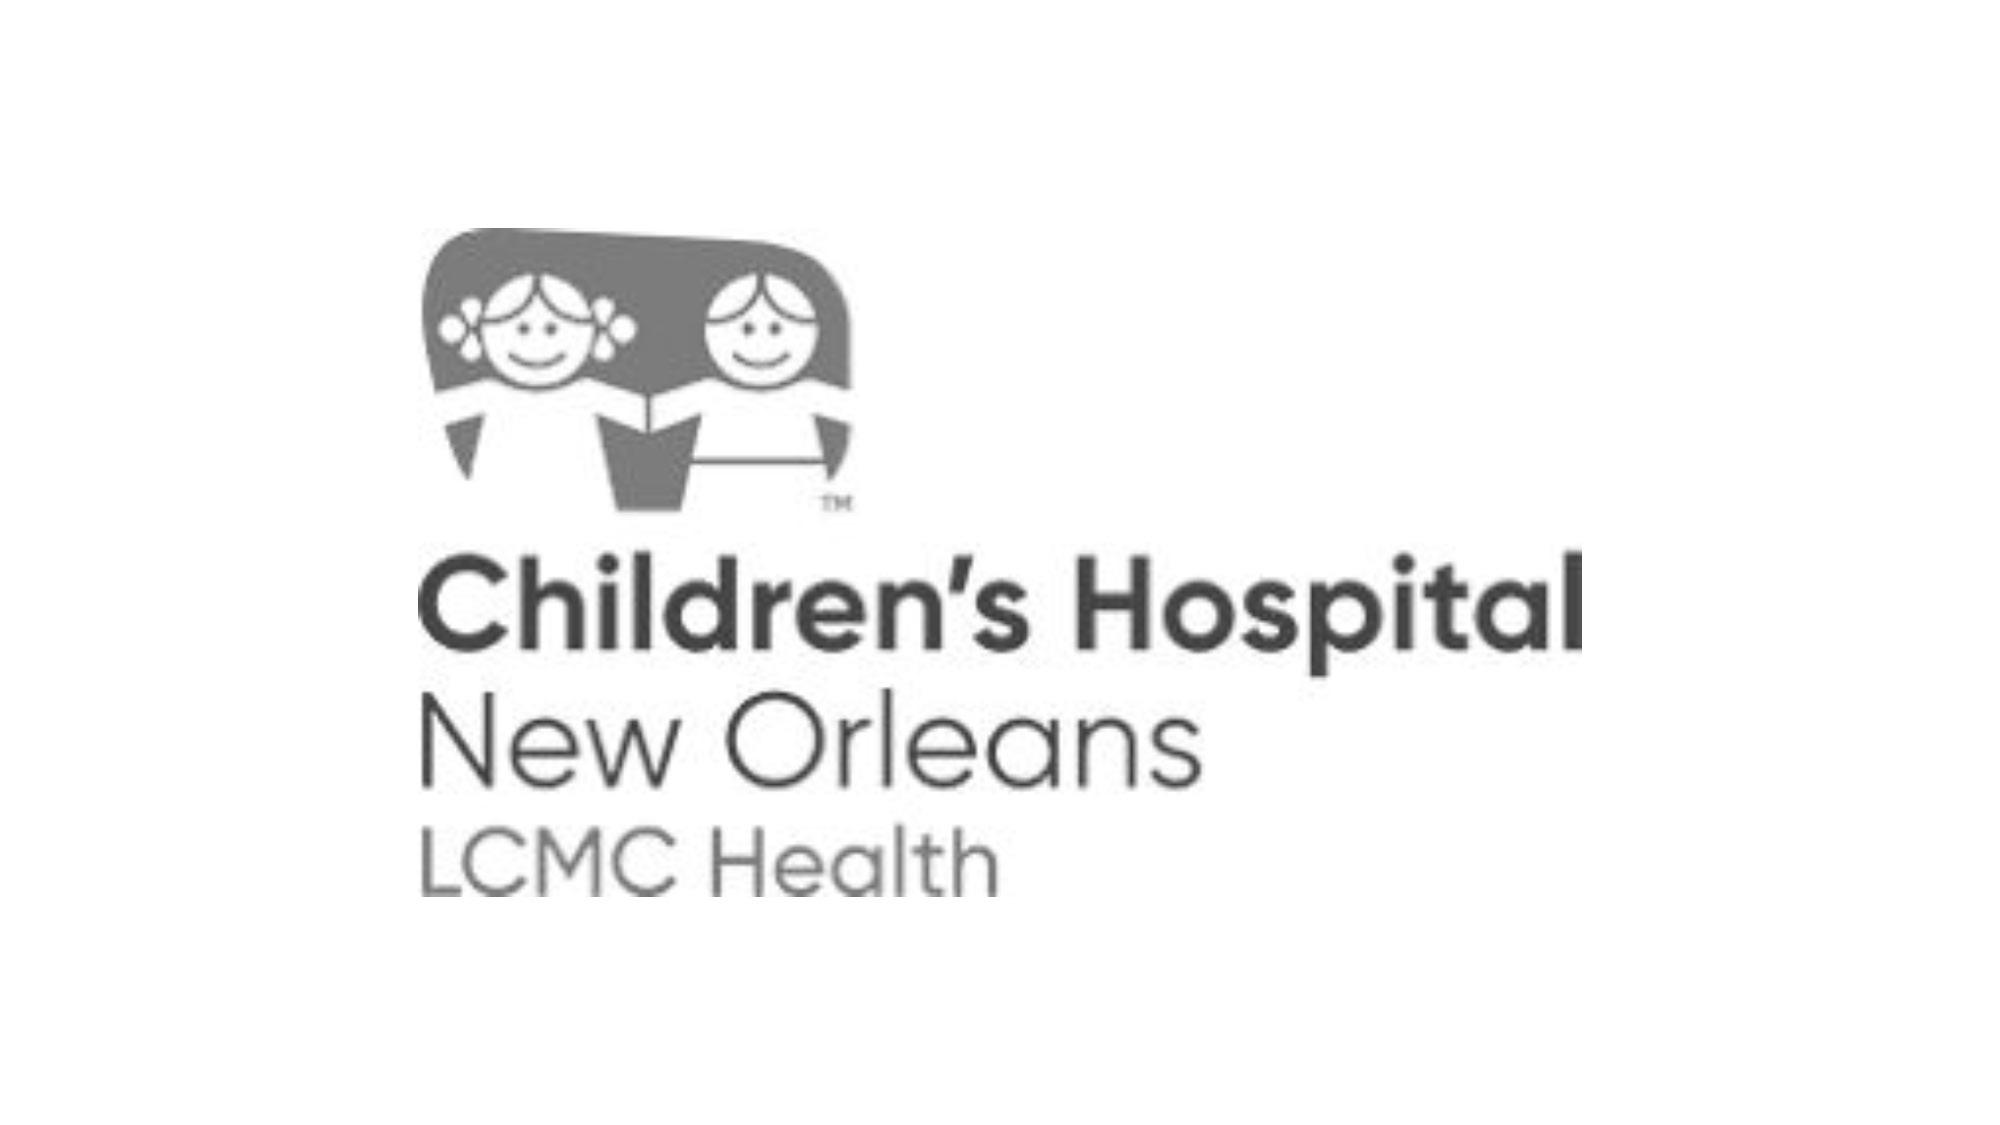 Children's Hospital - New Orleans - LCMC Health logo